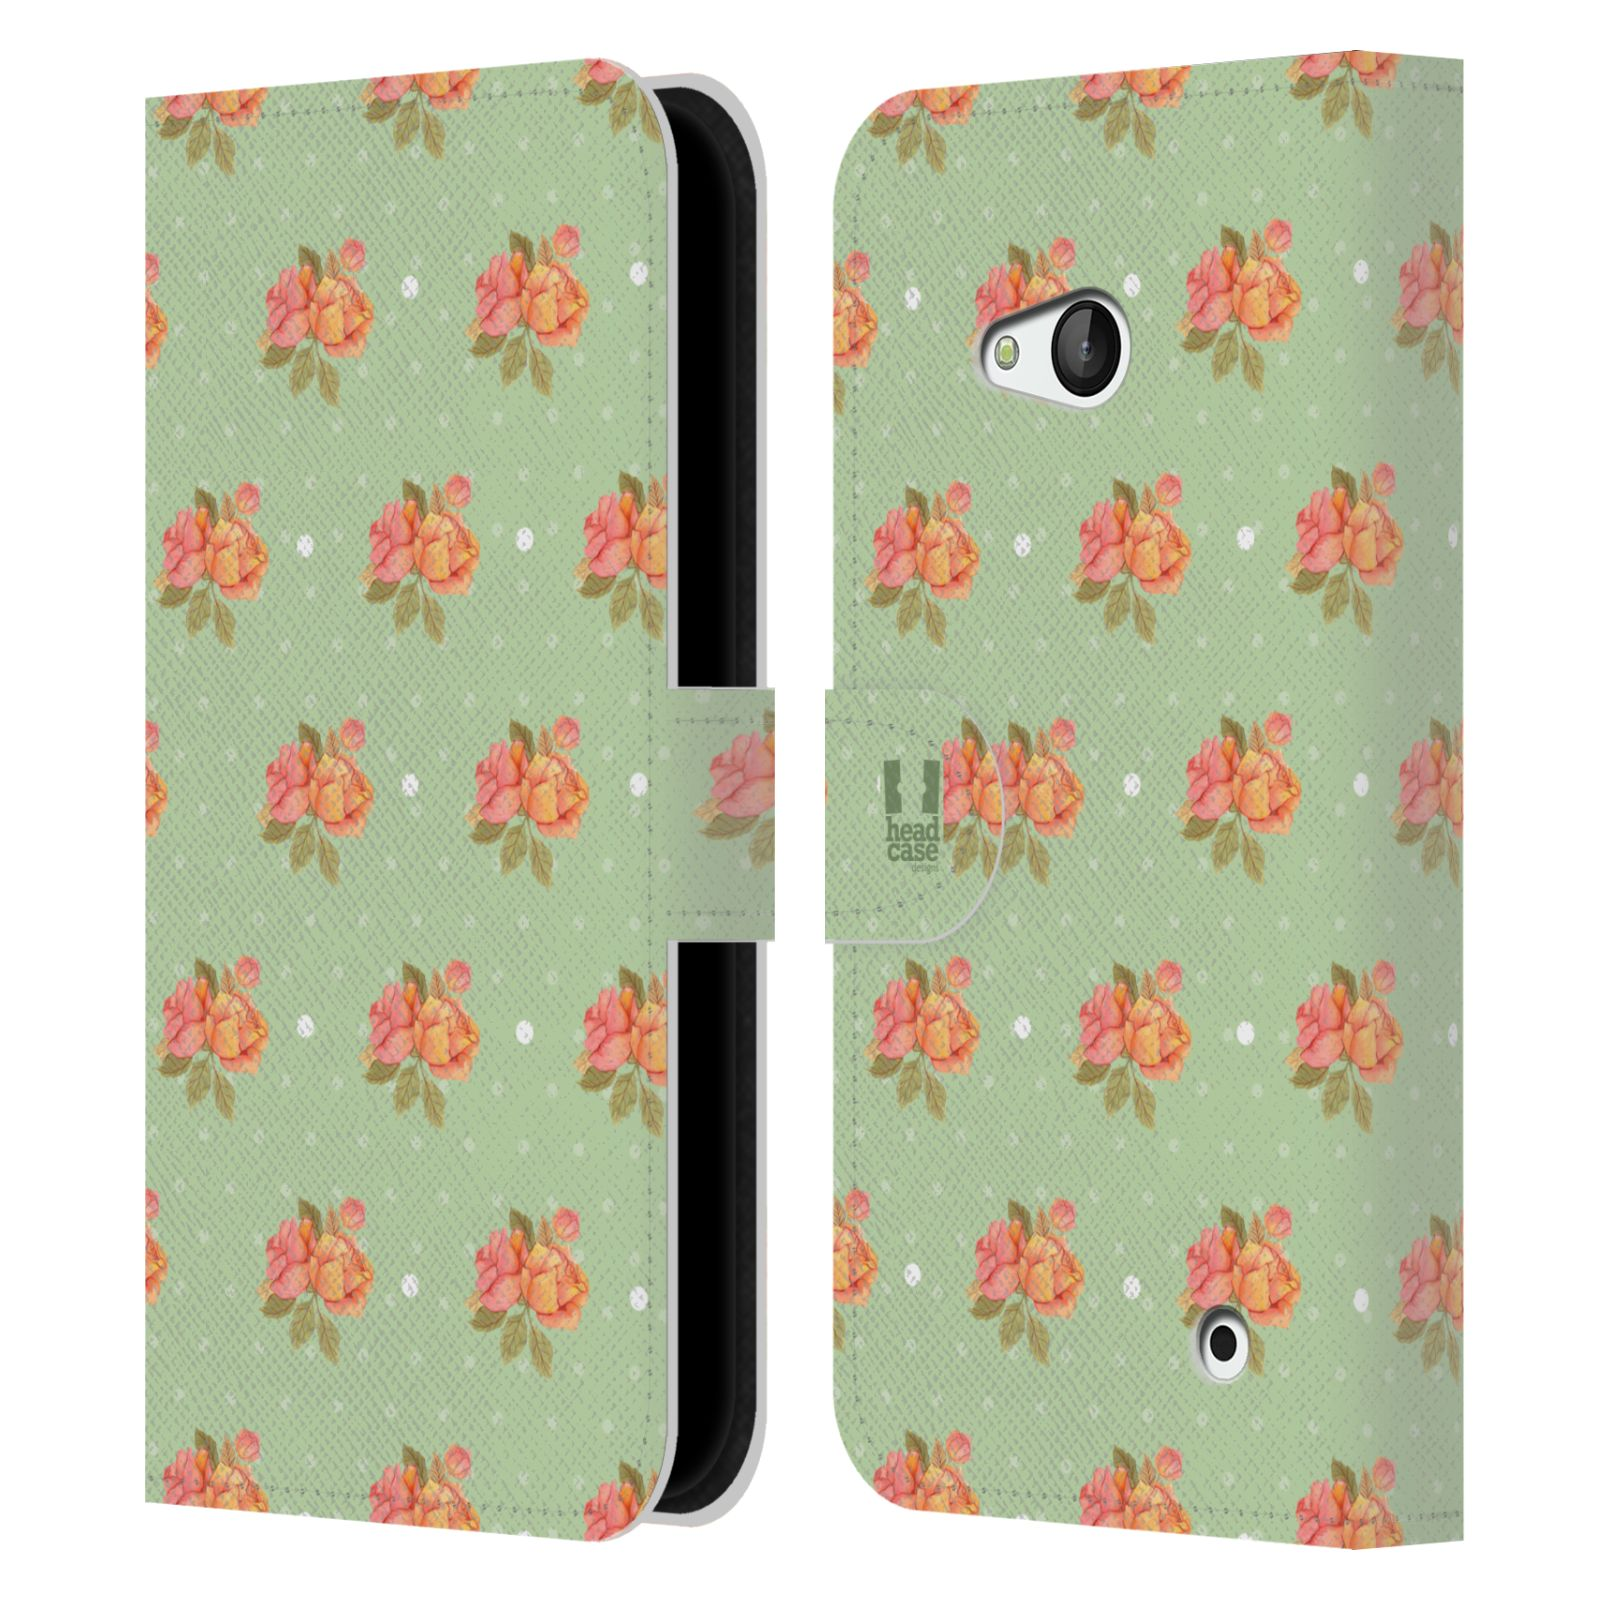 HEAD CASE Flipové pouzdro pro mobil NOKIA / MICROSOFT LUMIA 640 / LUMIA 640 DUAL romantické květy jaro zelená